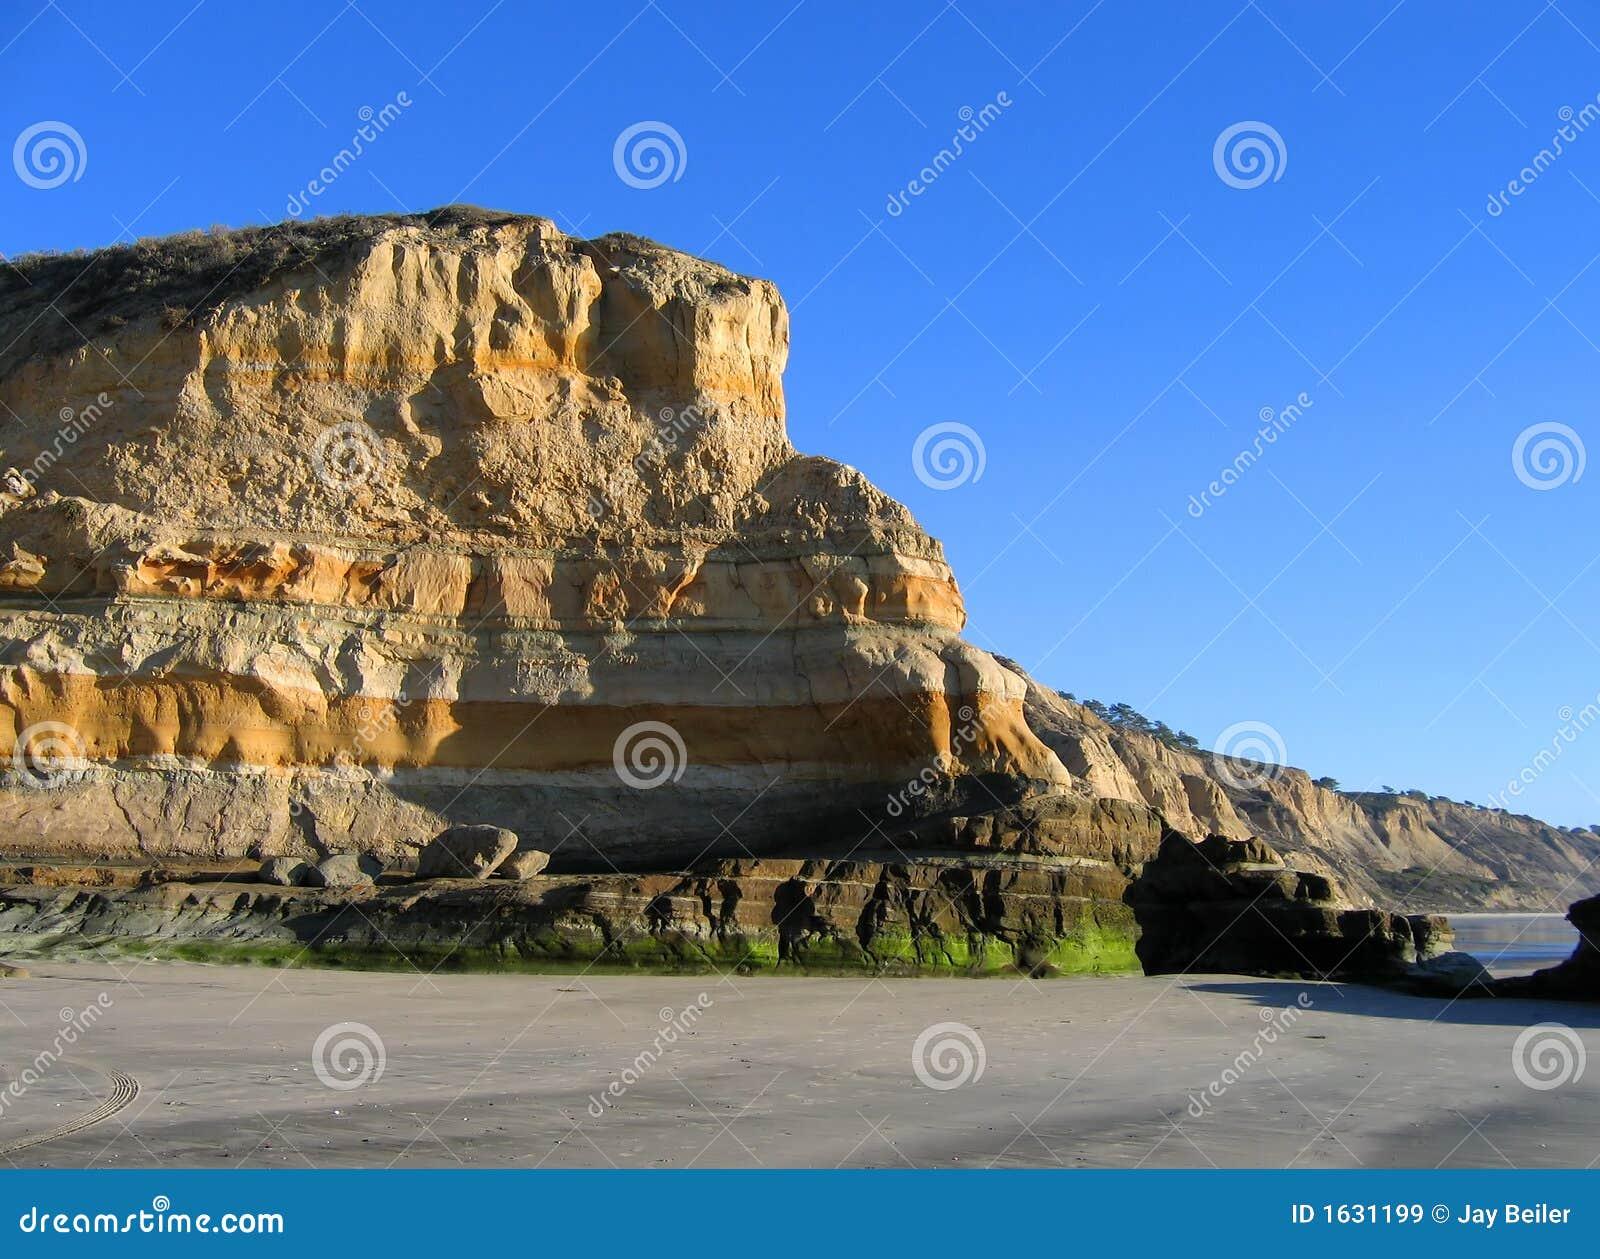 Cliffs at Torrey Pines State Beach, La Jolla, California